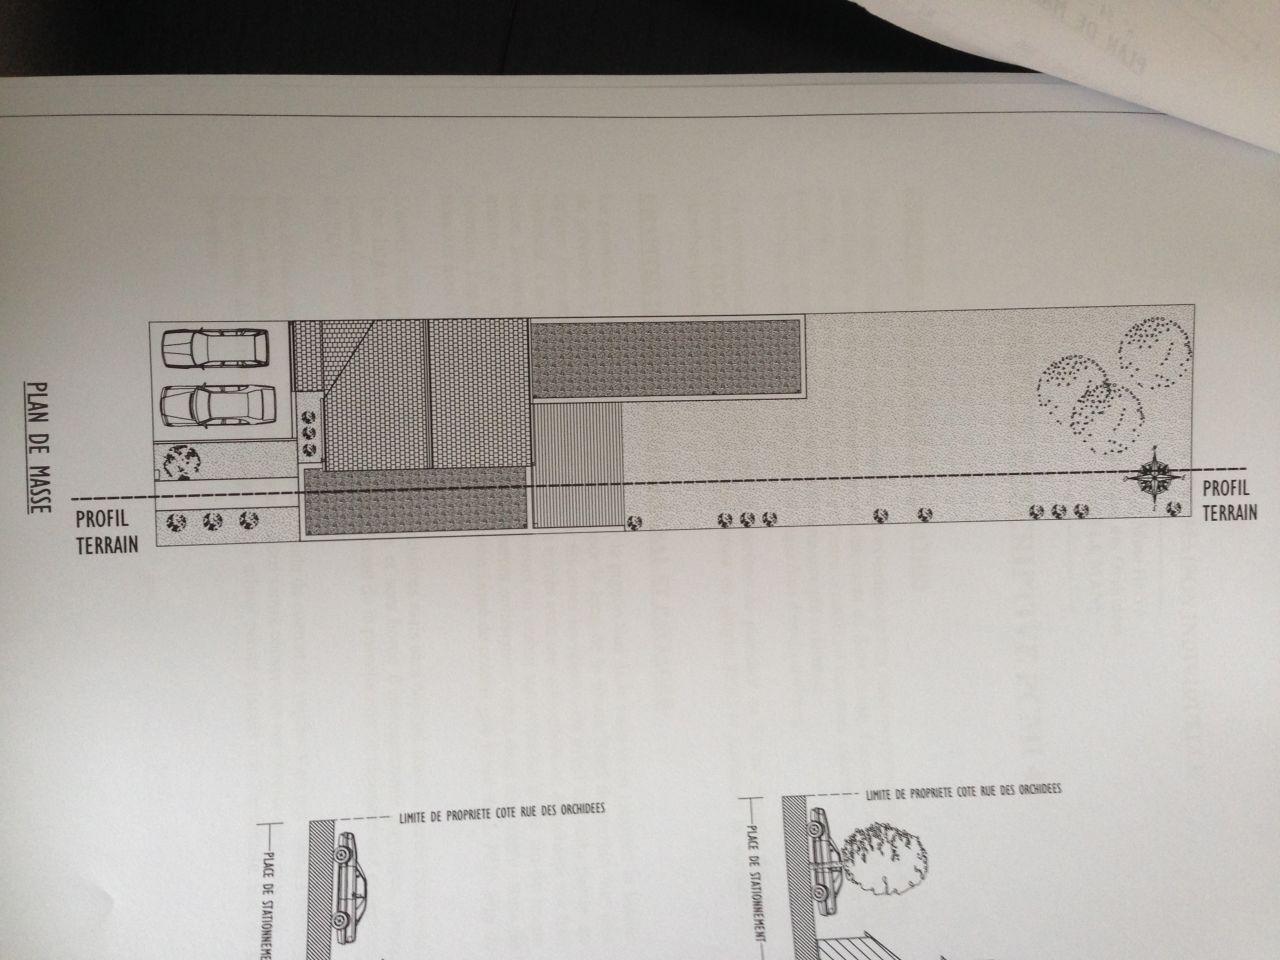 extension quasi 60 m2 avis conseils merci 7 messages. Black Bedroom Furniture Sets. Home Design Ideas